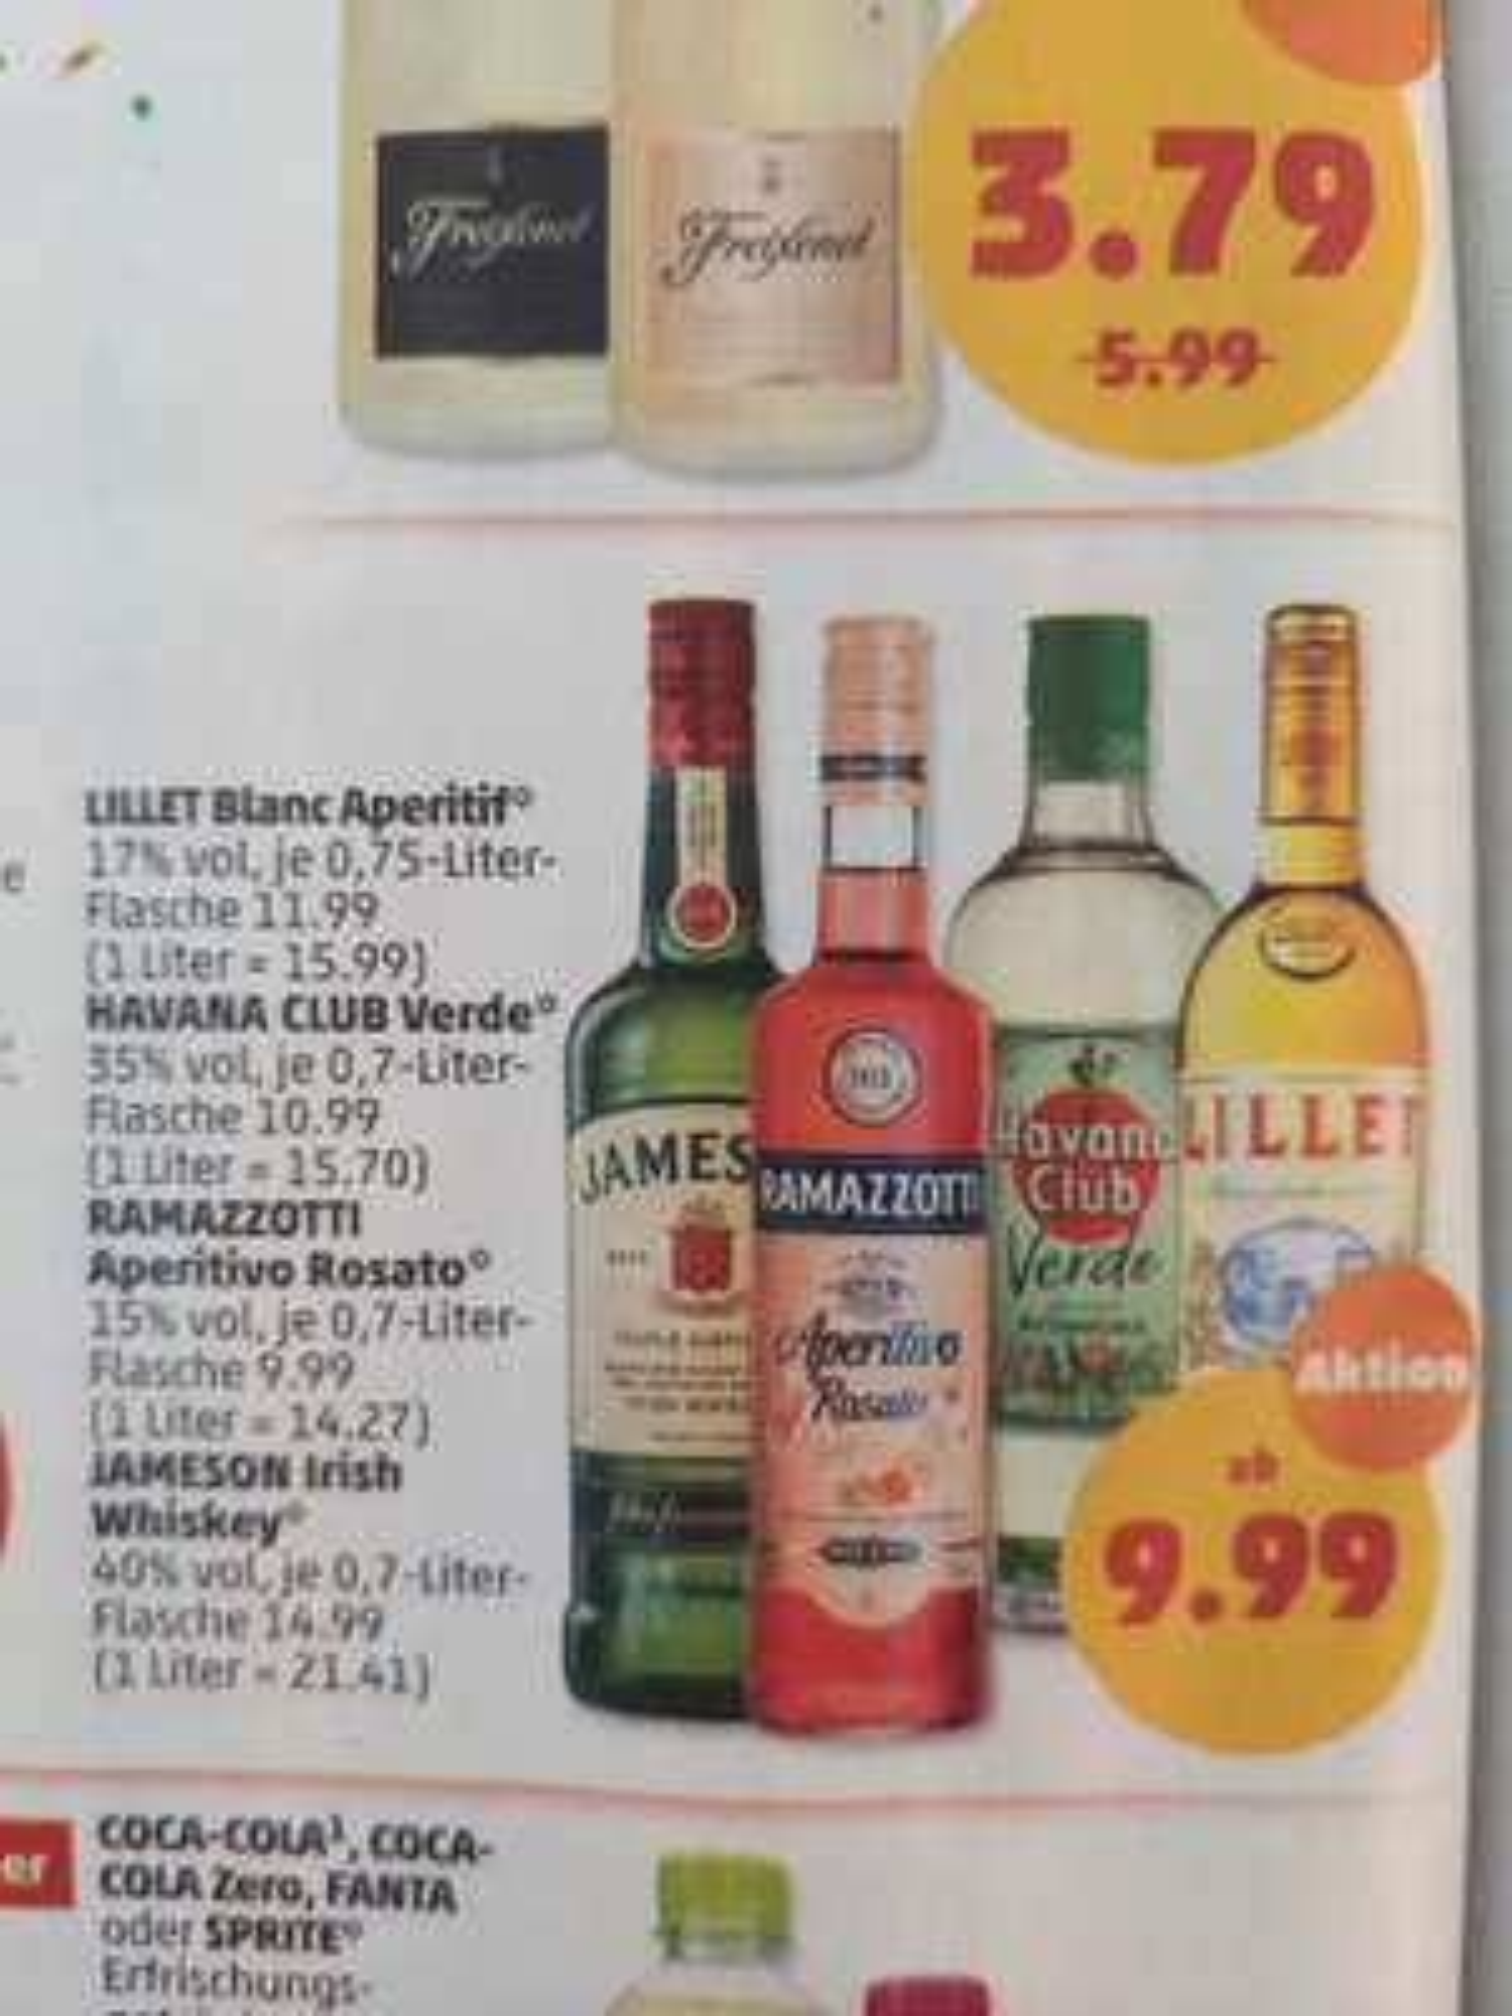 PENNY verschiedene Spirituosen ab 9,99€, z.B. RAMAZZOTTI Aperitivo Rosato 0,7-Liter